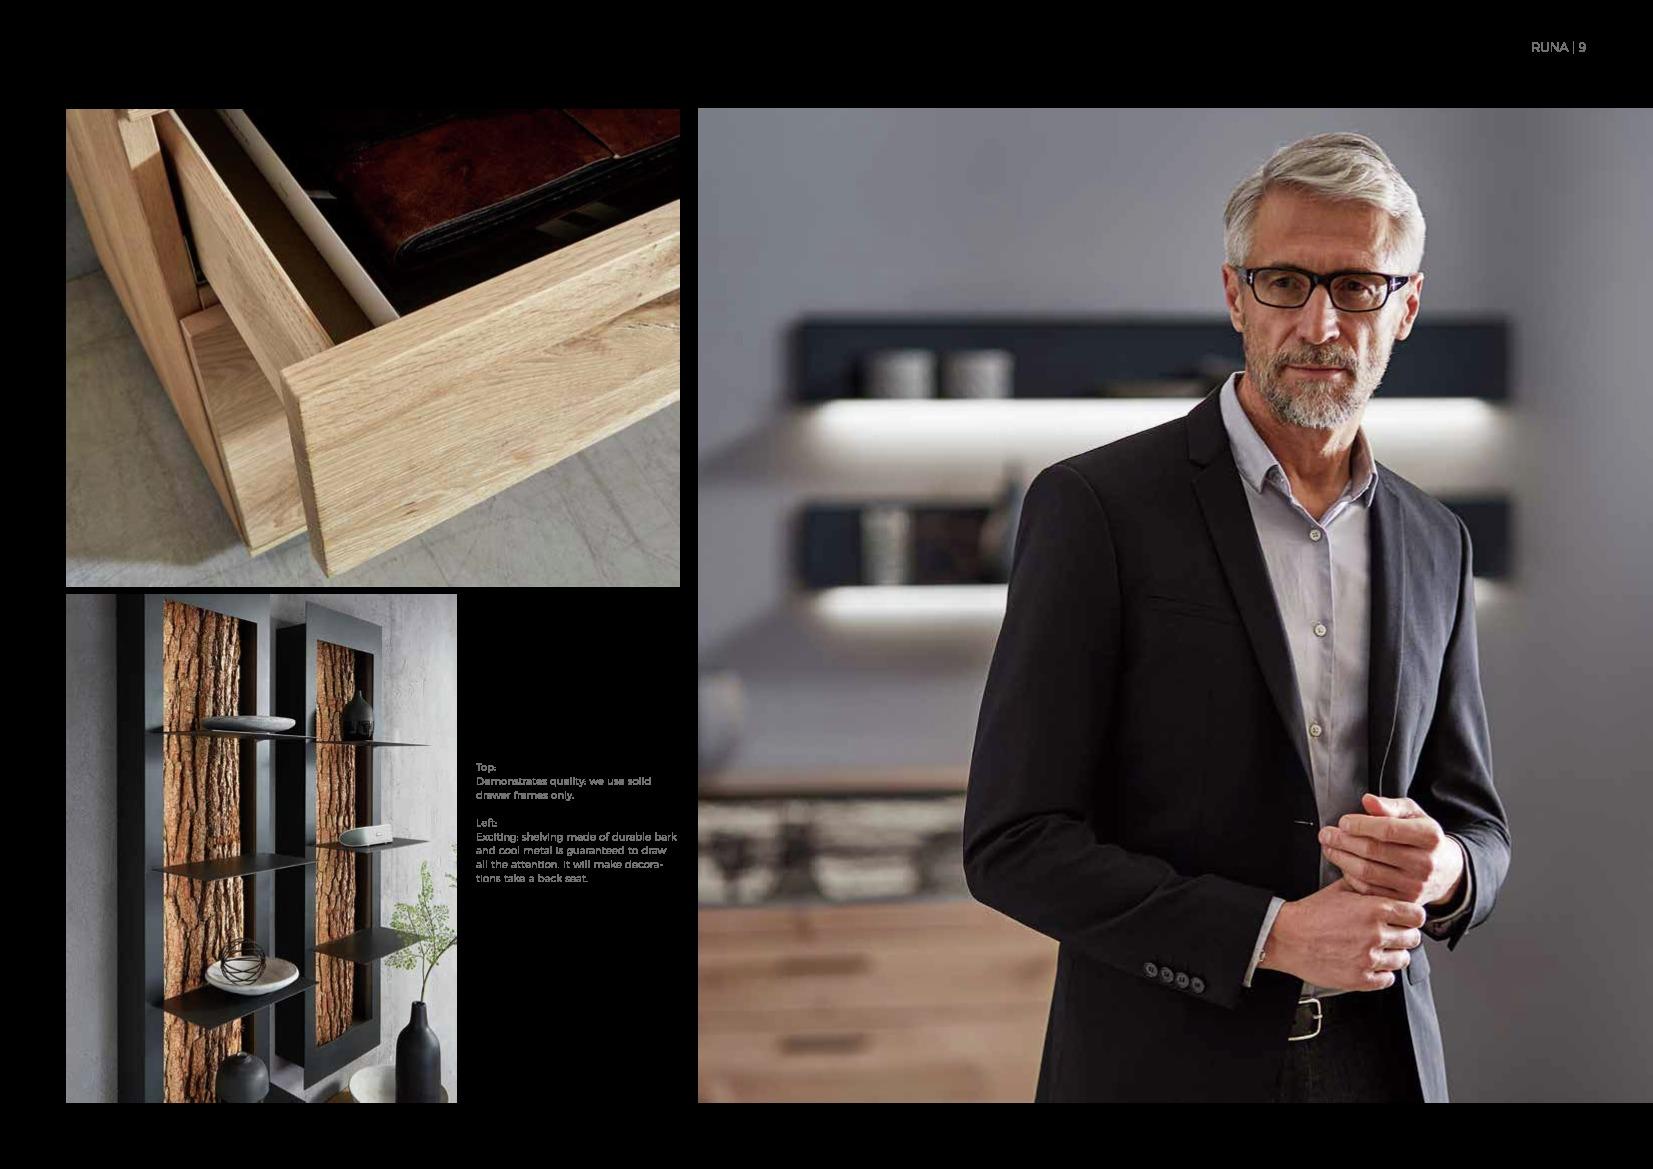 hartmann farbprospekt runa 4 m bel weber neustadt landau karlsruhe. Black Bedroom Furniture Sets. Home Design Ideas